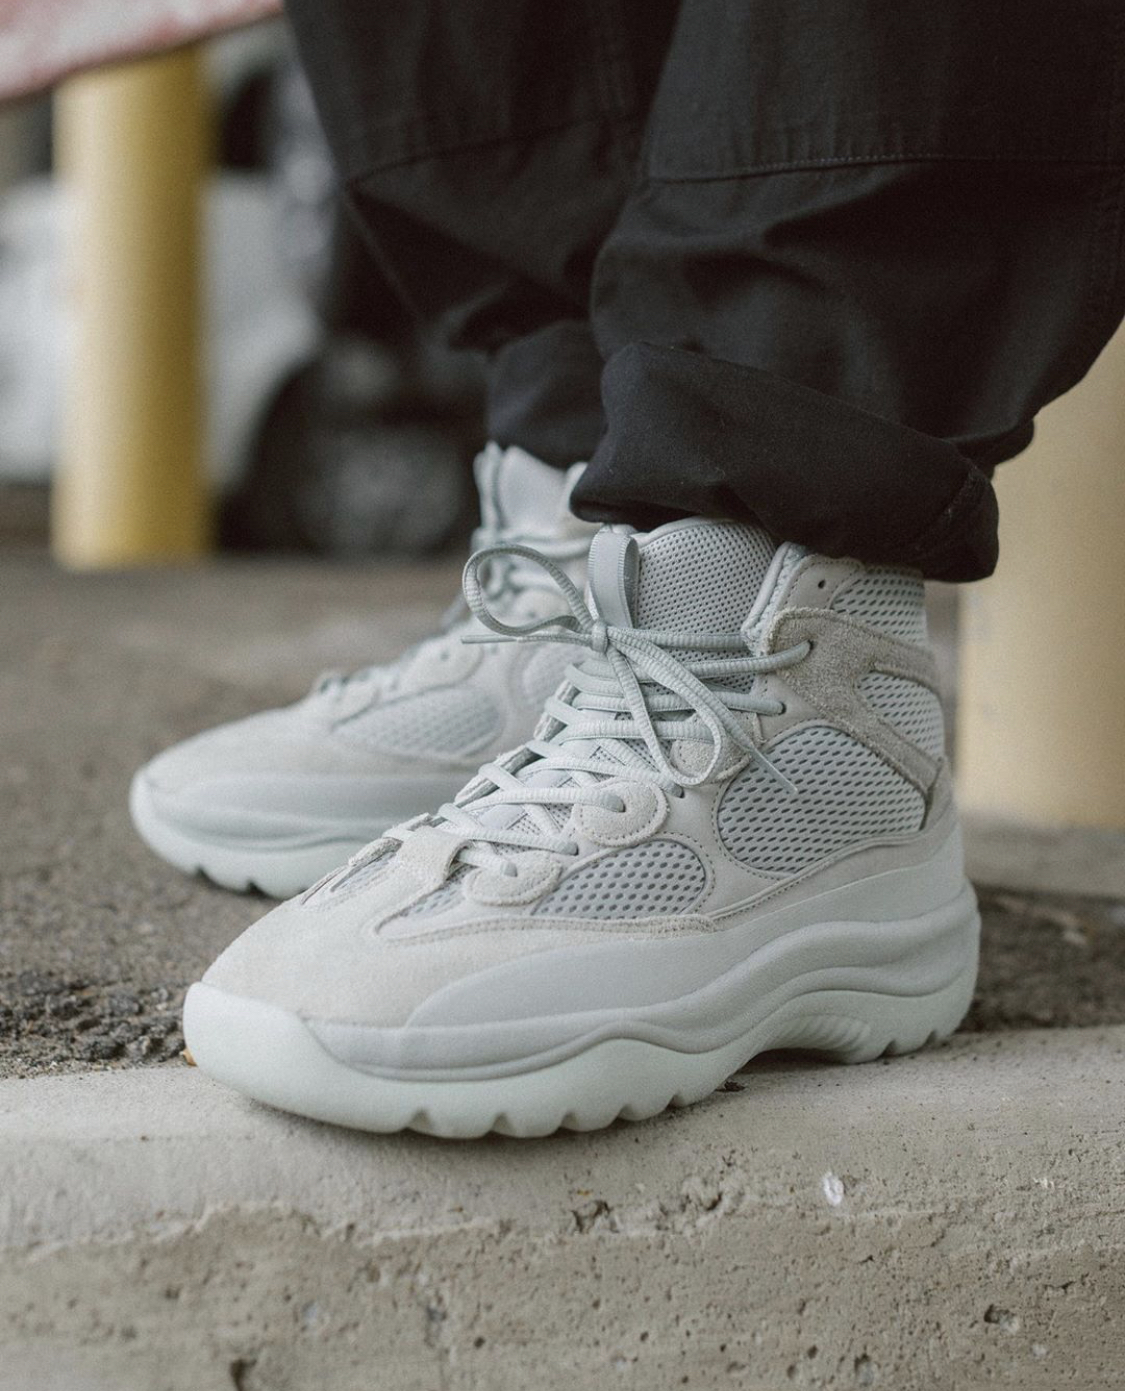 Where To Buy The Adidas Yeezy Desert Boot Salt • KicksOnFire.com